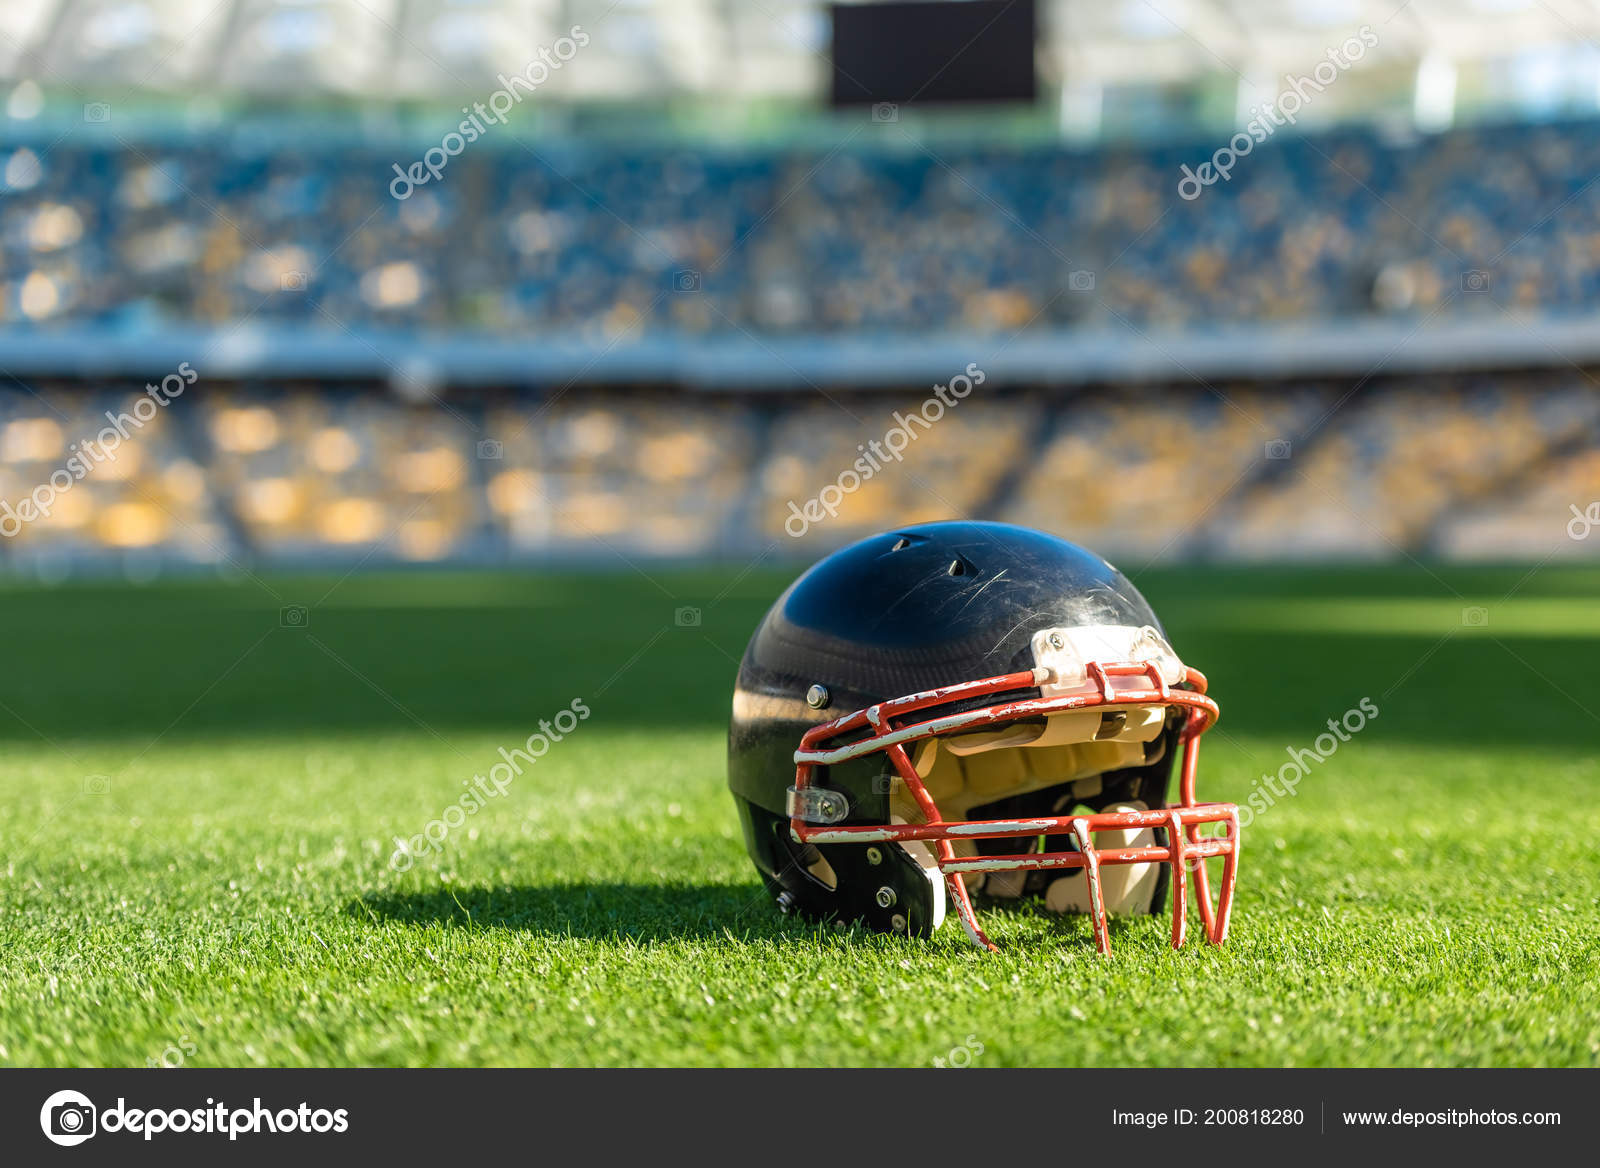 Nahaufnahme Der American Football Helm Auf Dem Grünen Rasen